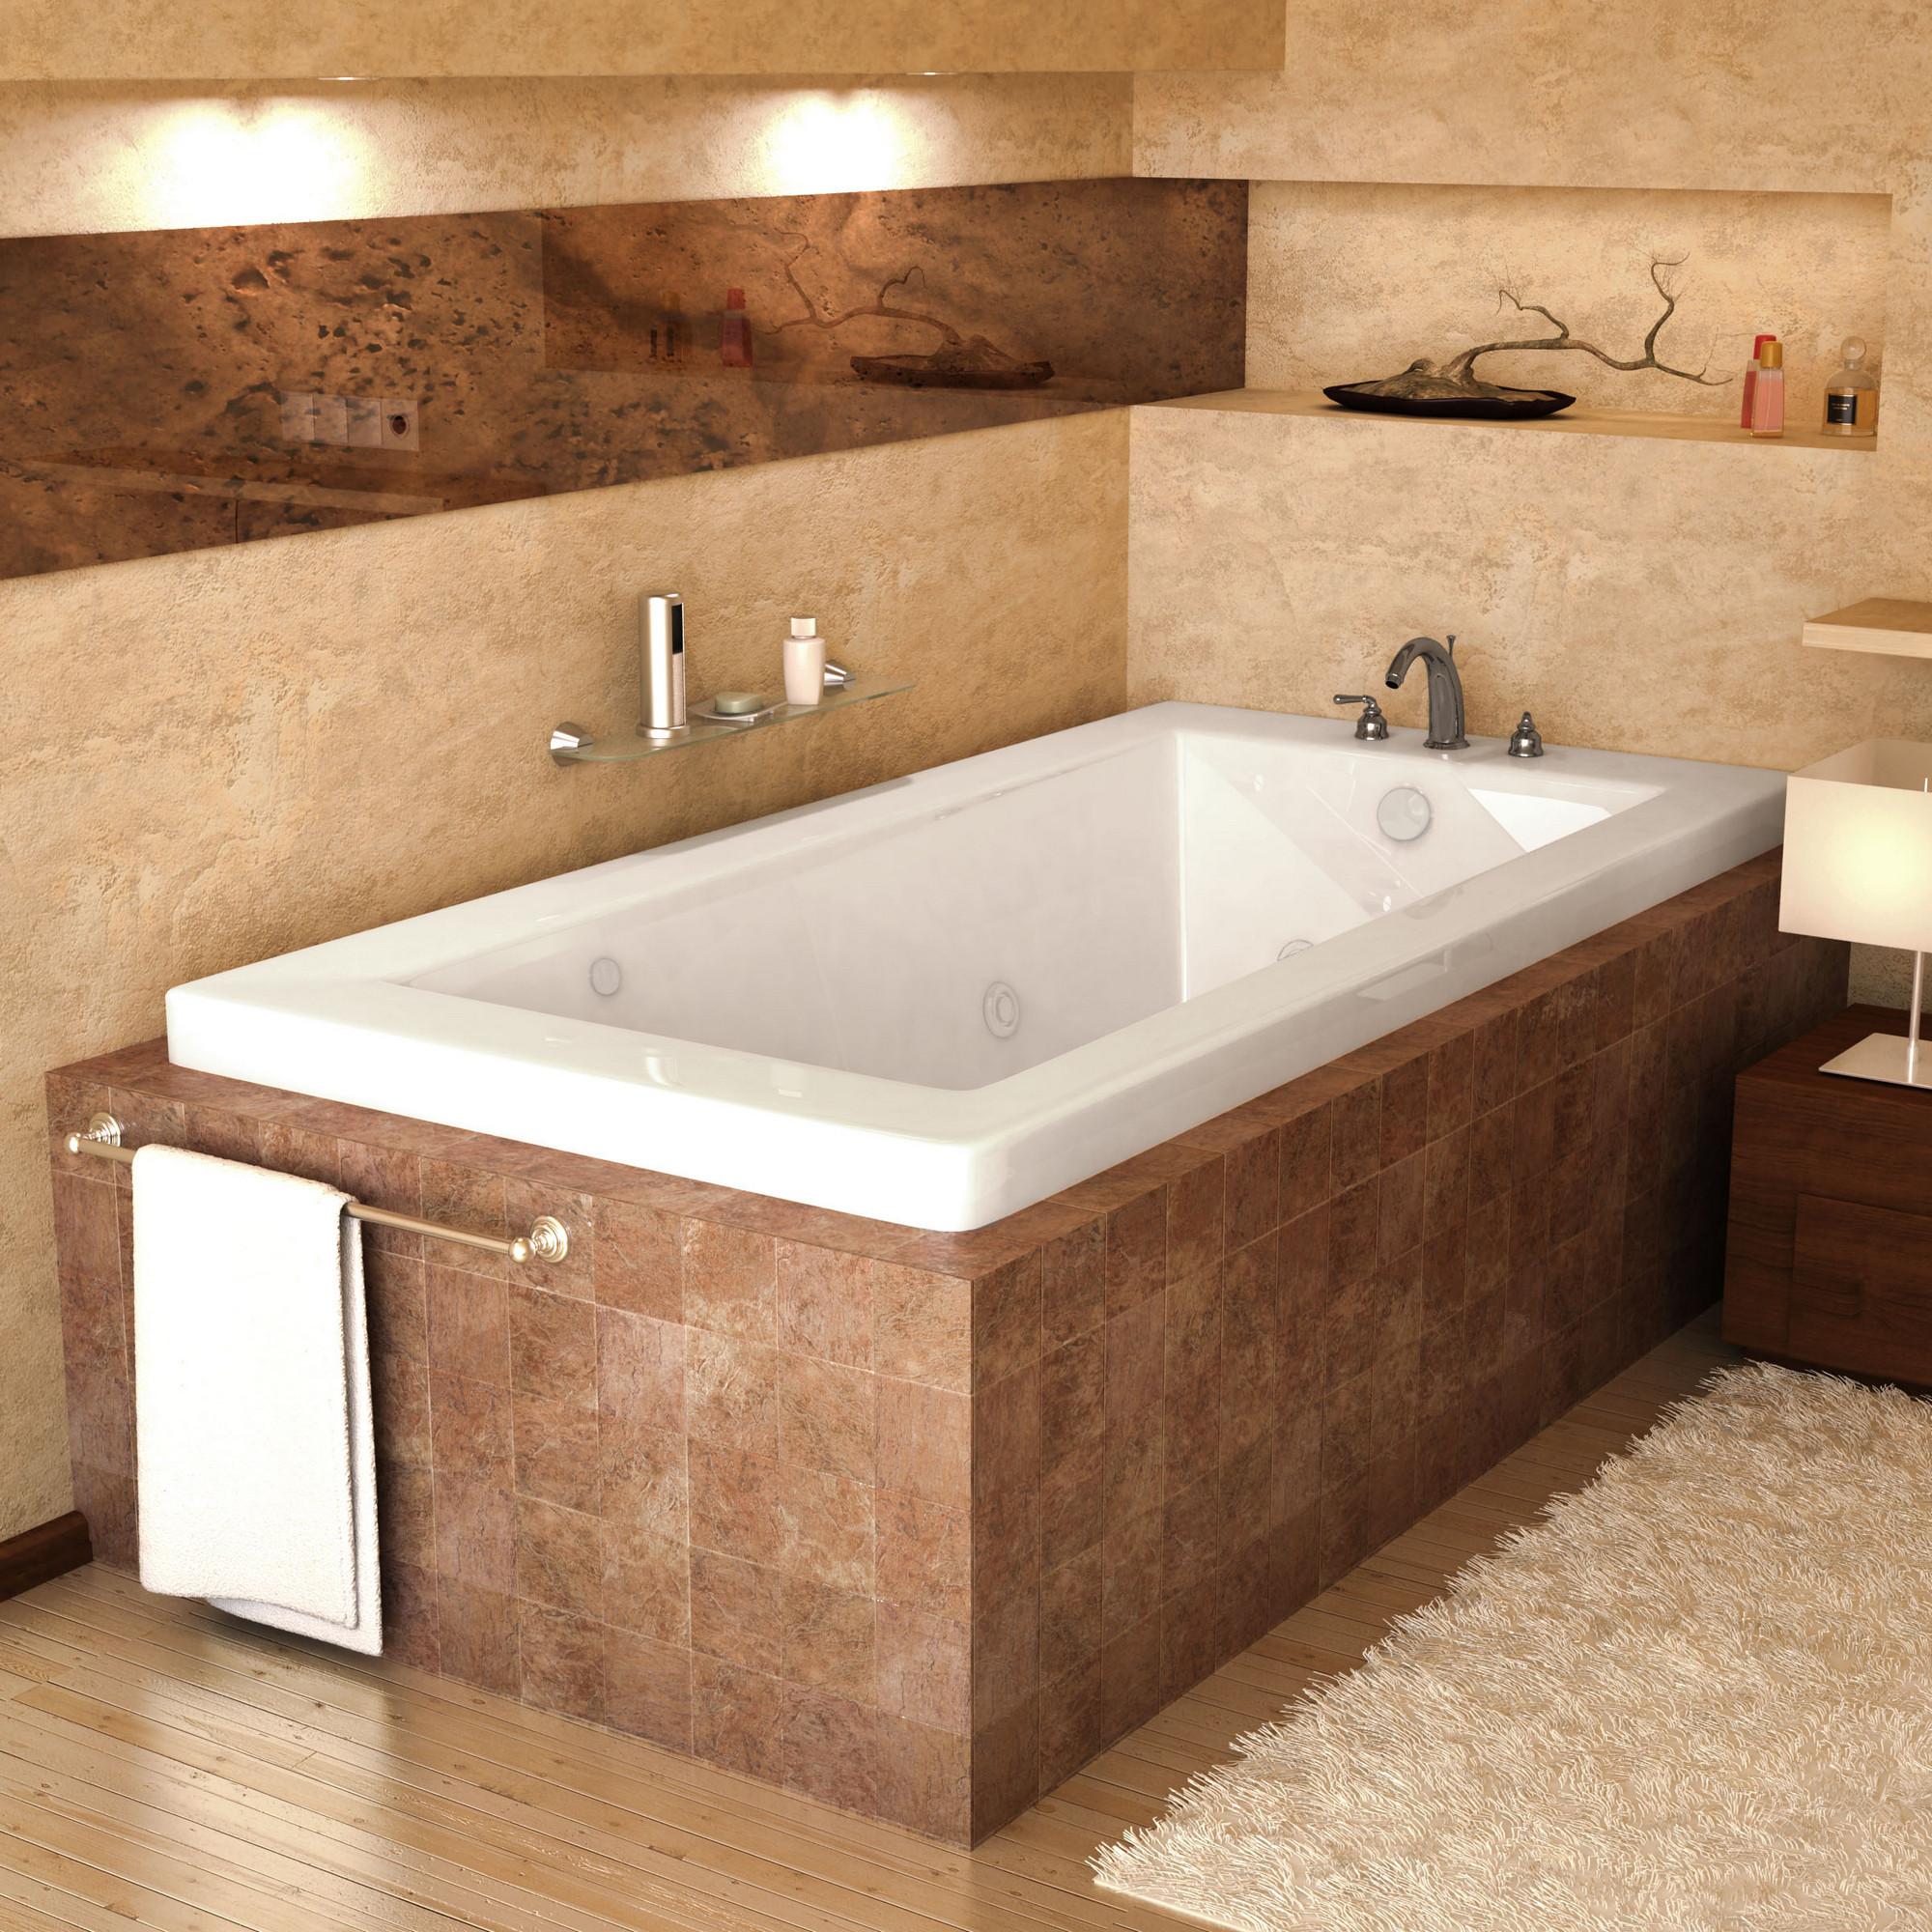 MediTub 3660VNWR Venetian Rectangular Whirlpool Bathtub With Right Drain